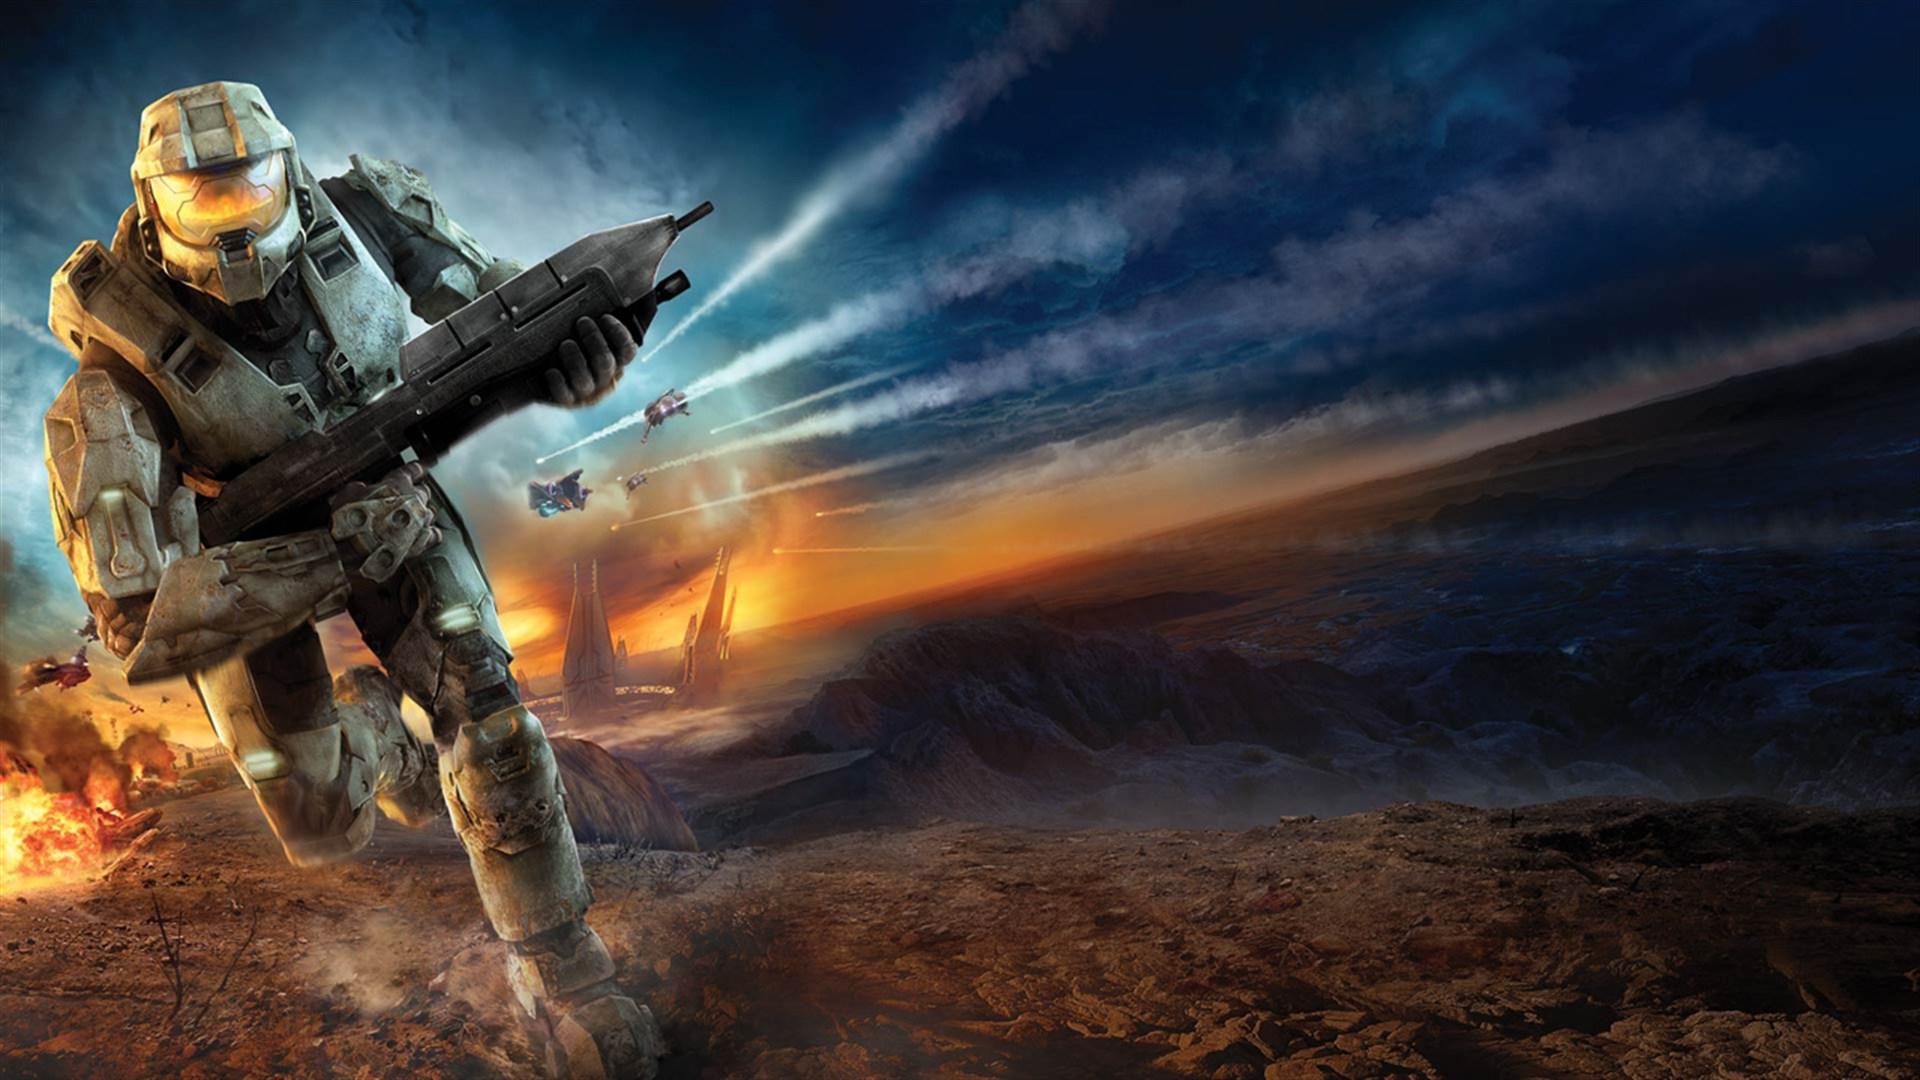 Halo 3 Cold Storage Map